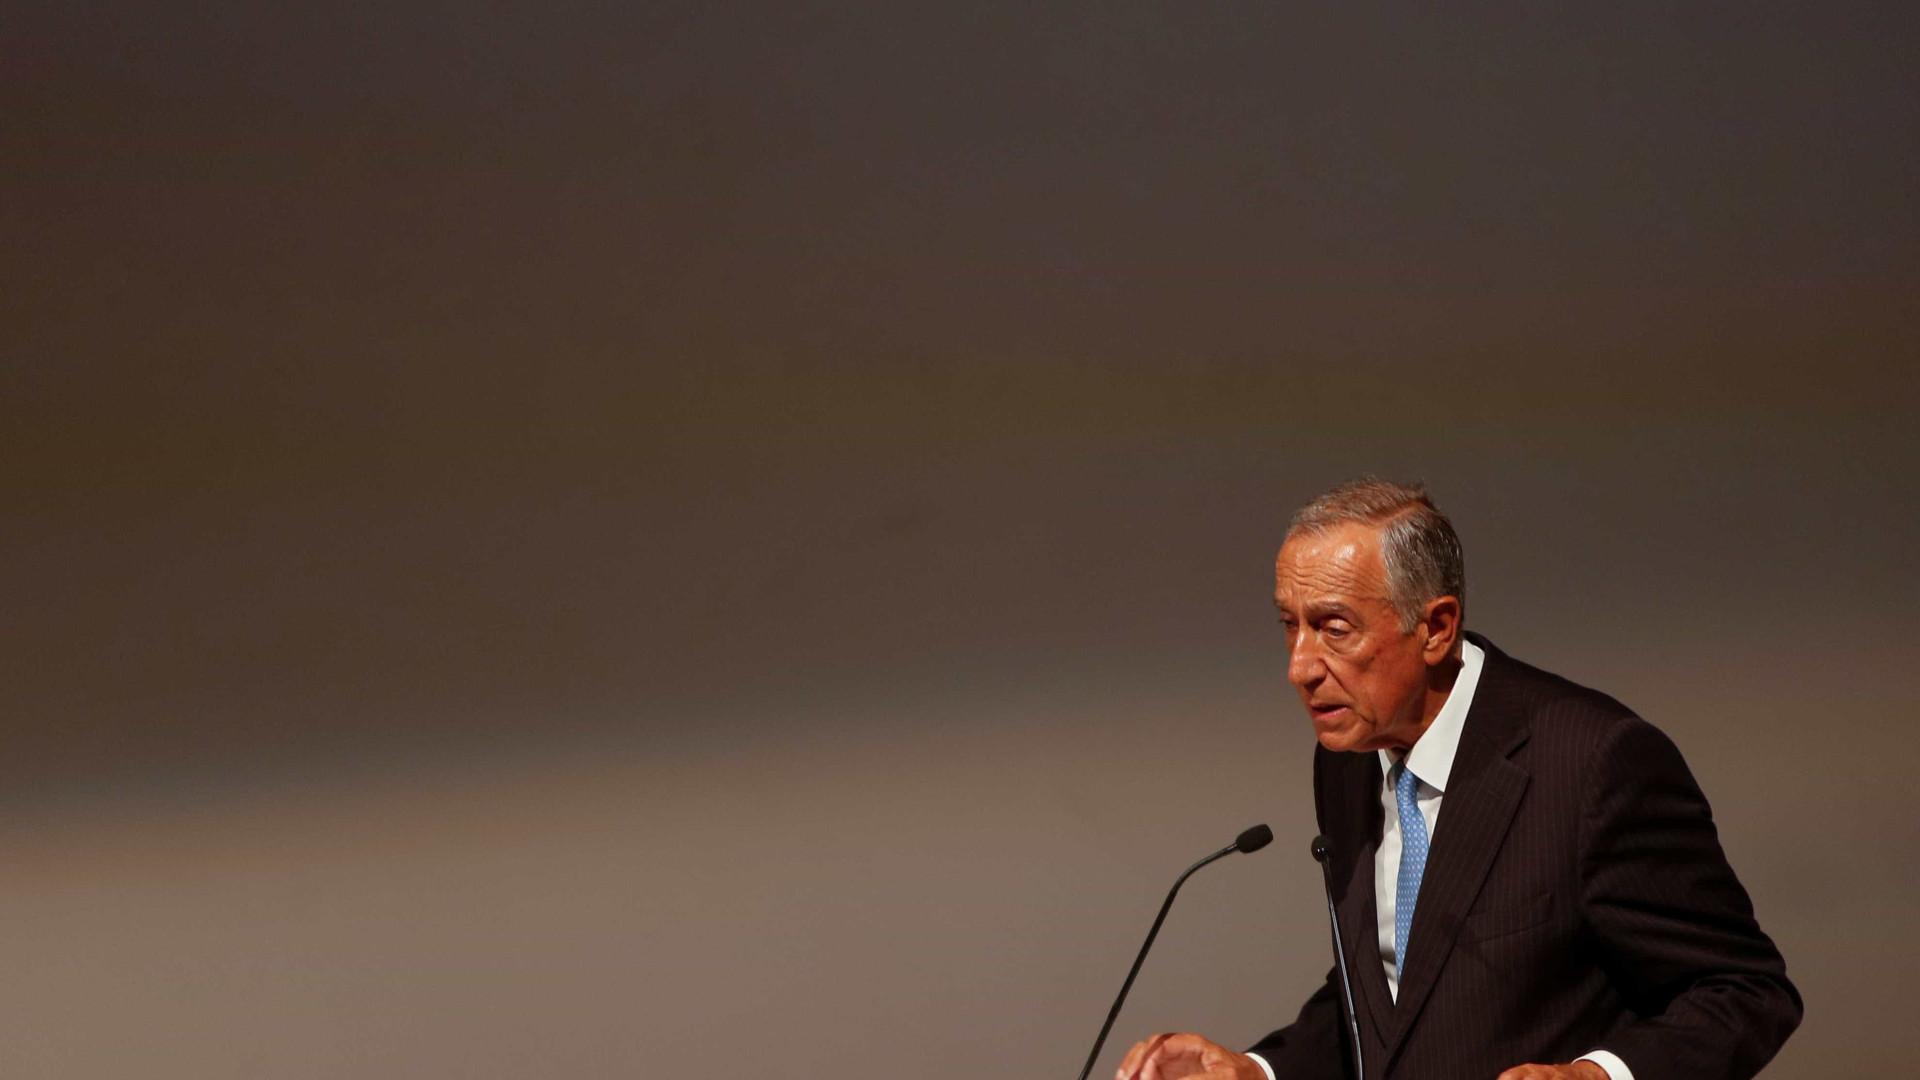 Presidente entrega prémios a Afonso Cruz e a José Carlos Vasconcelos